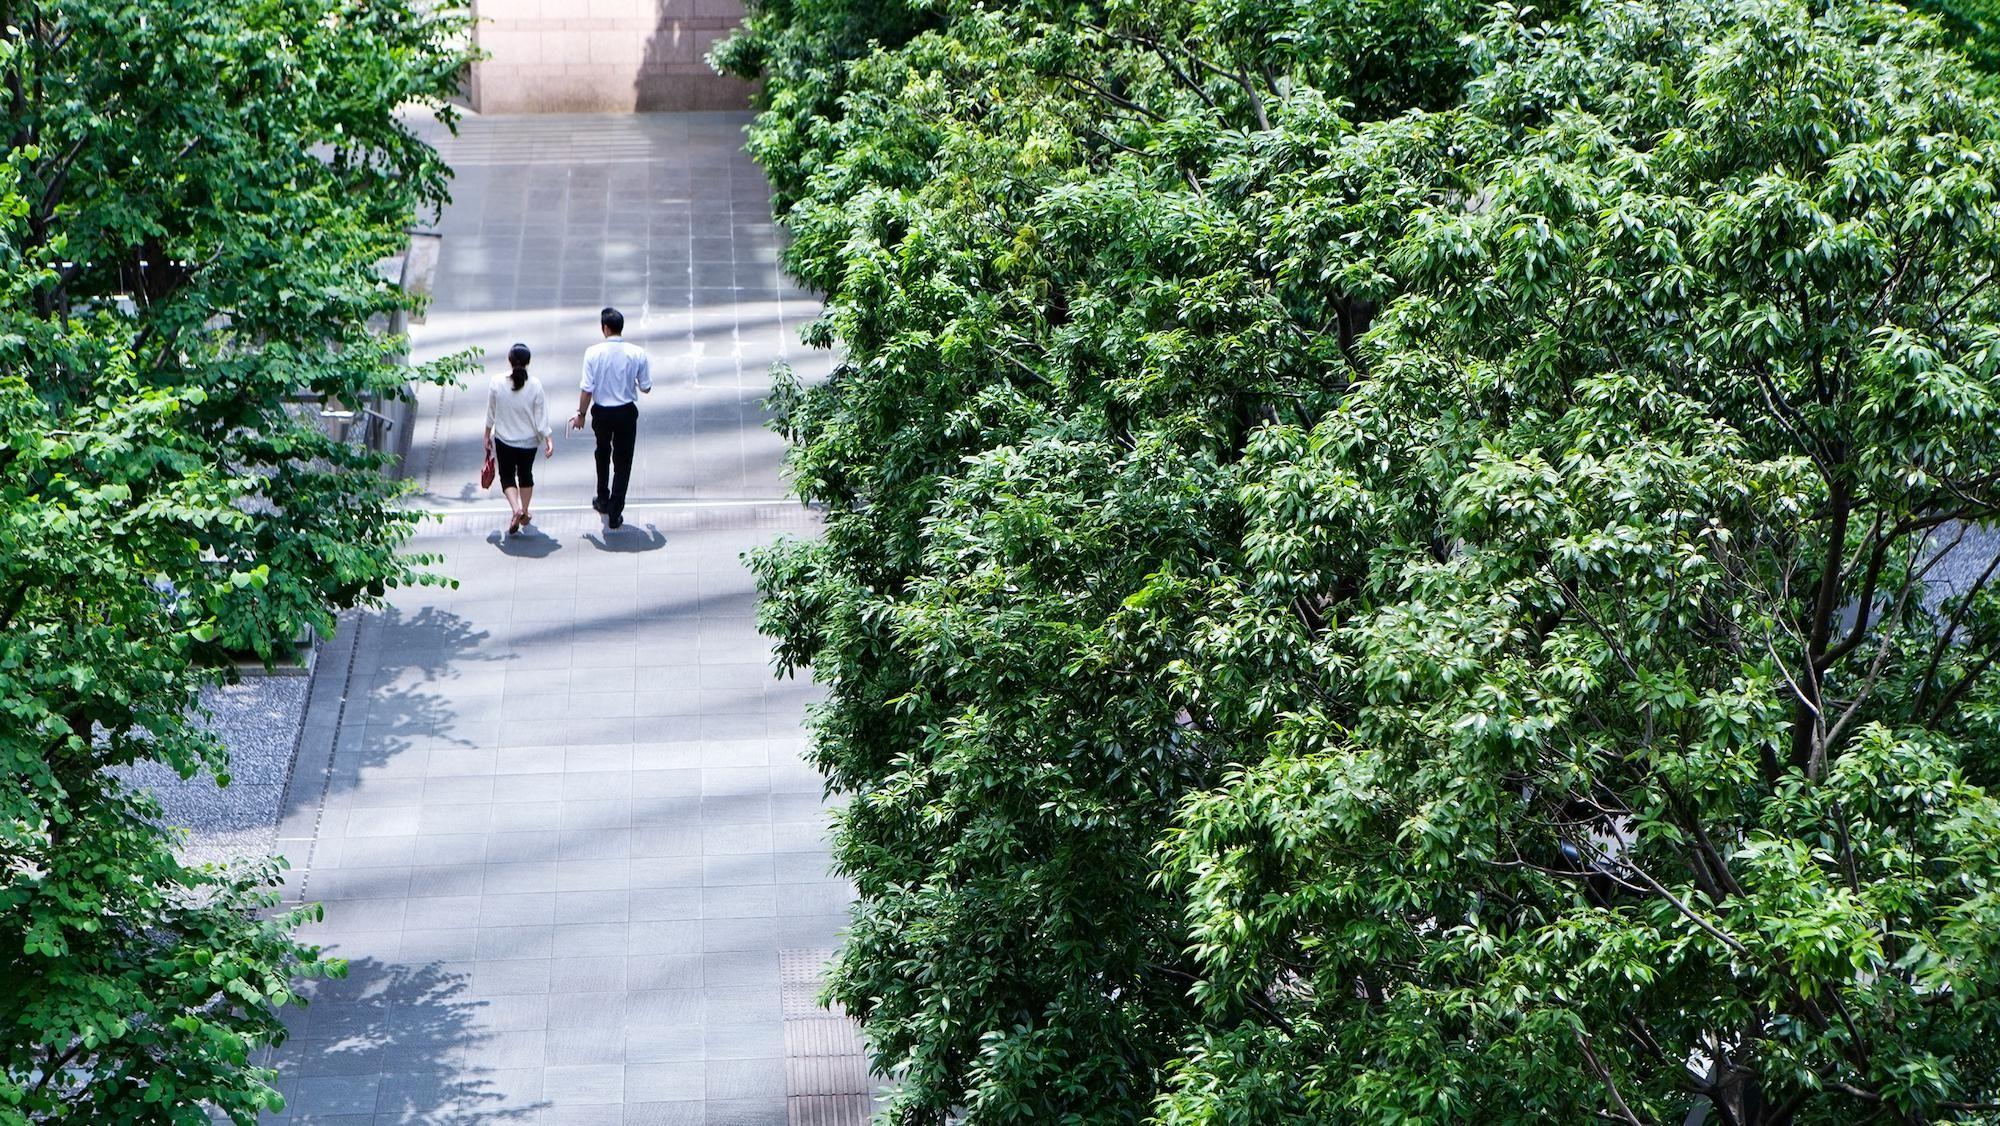 People walk on a tree-lined path